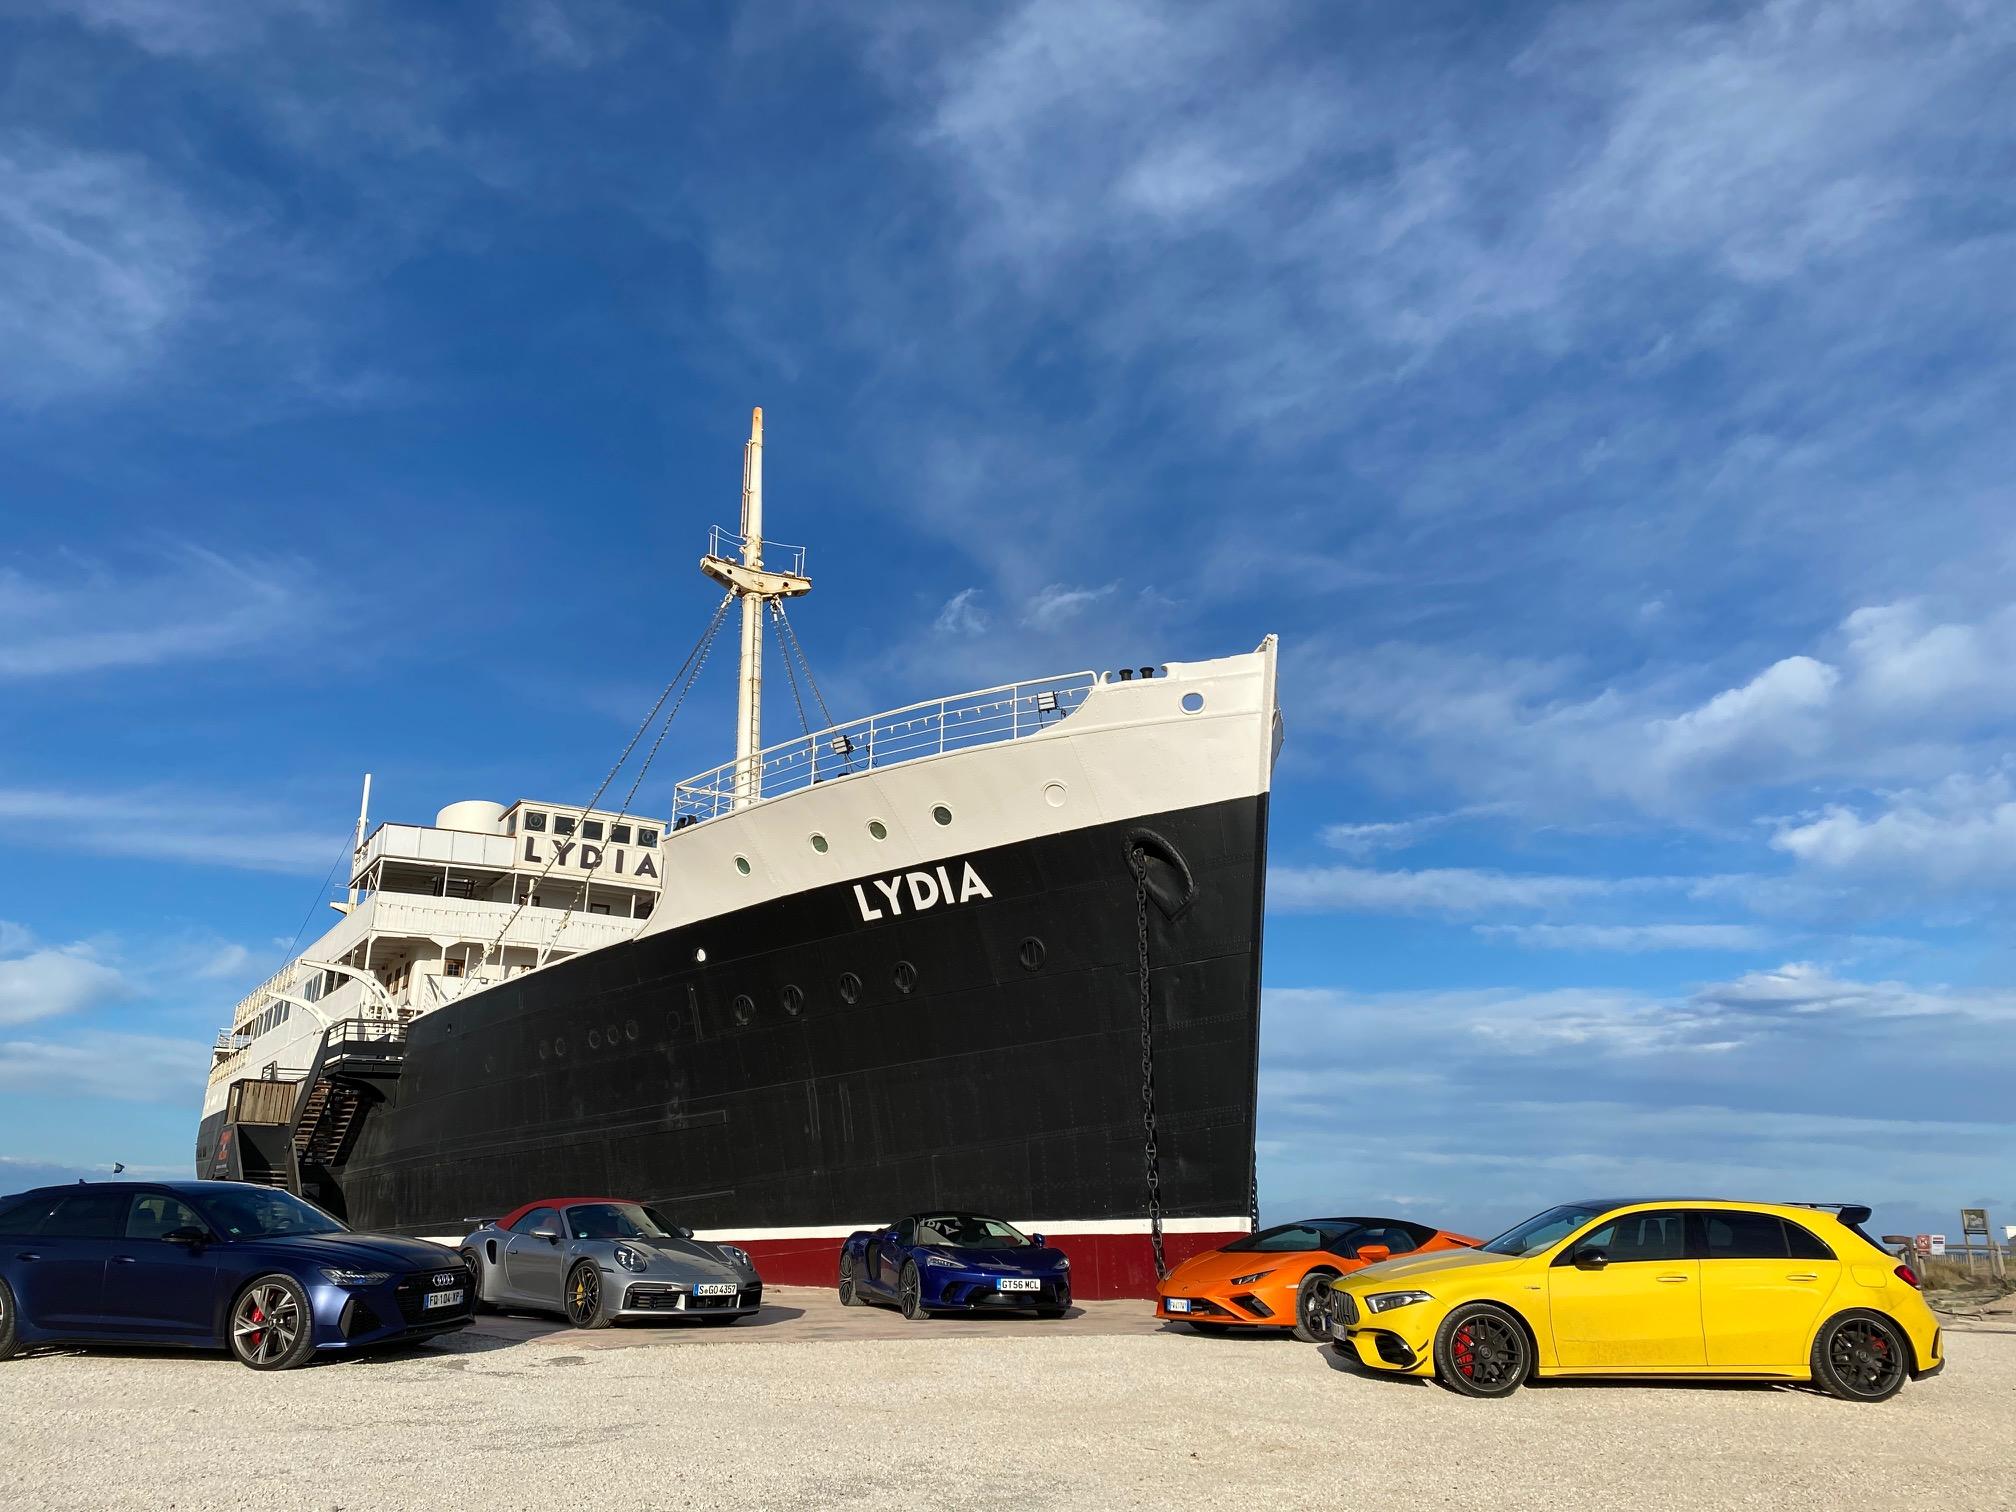 Mercedes, mercedes AMG, compacten compacte sportive, voiture sportive, A 45 S AMG, roadtrip, supercar, turbo